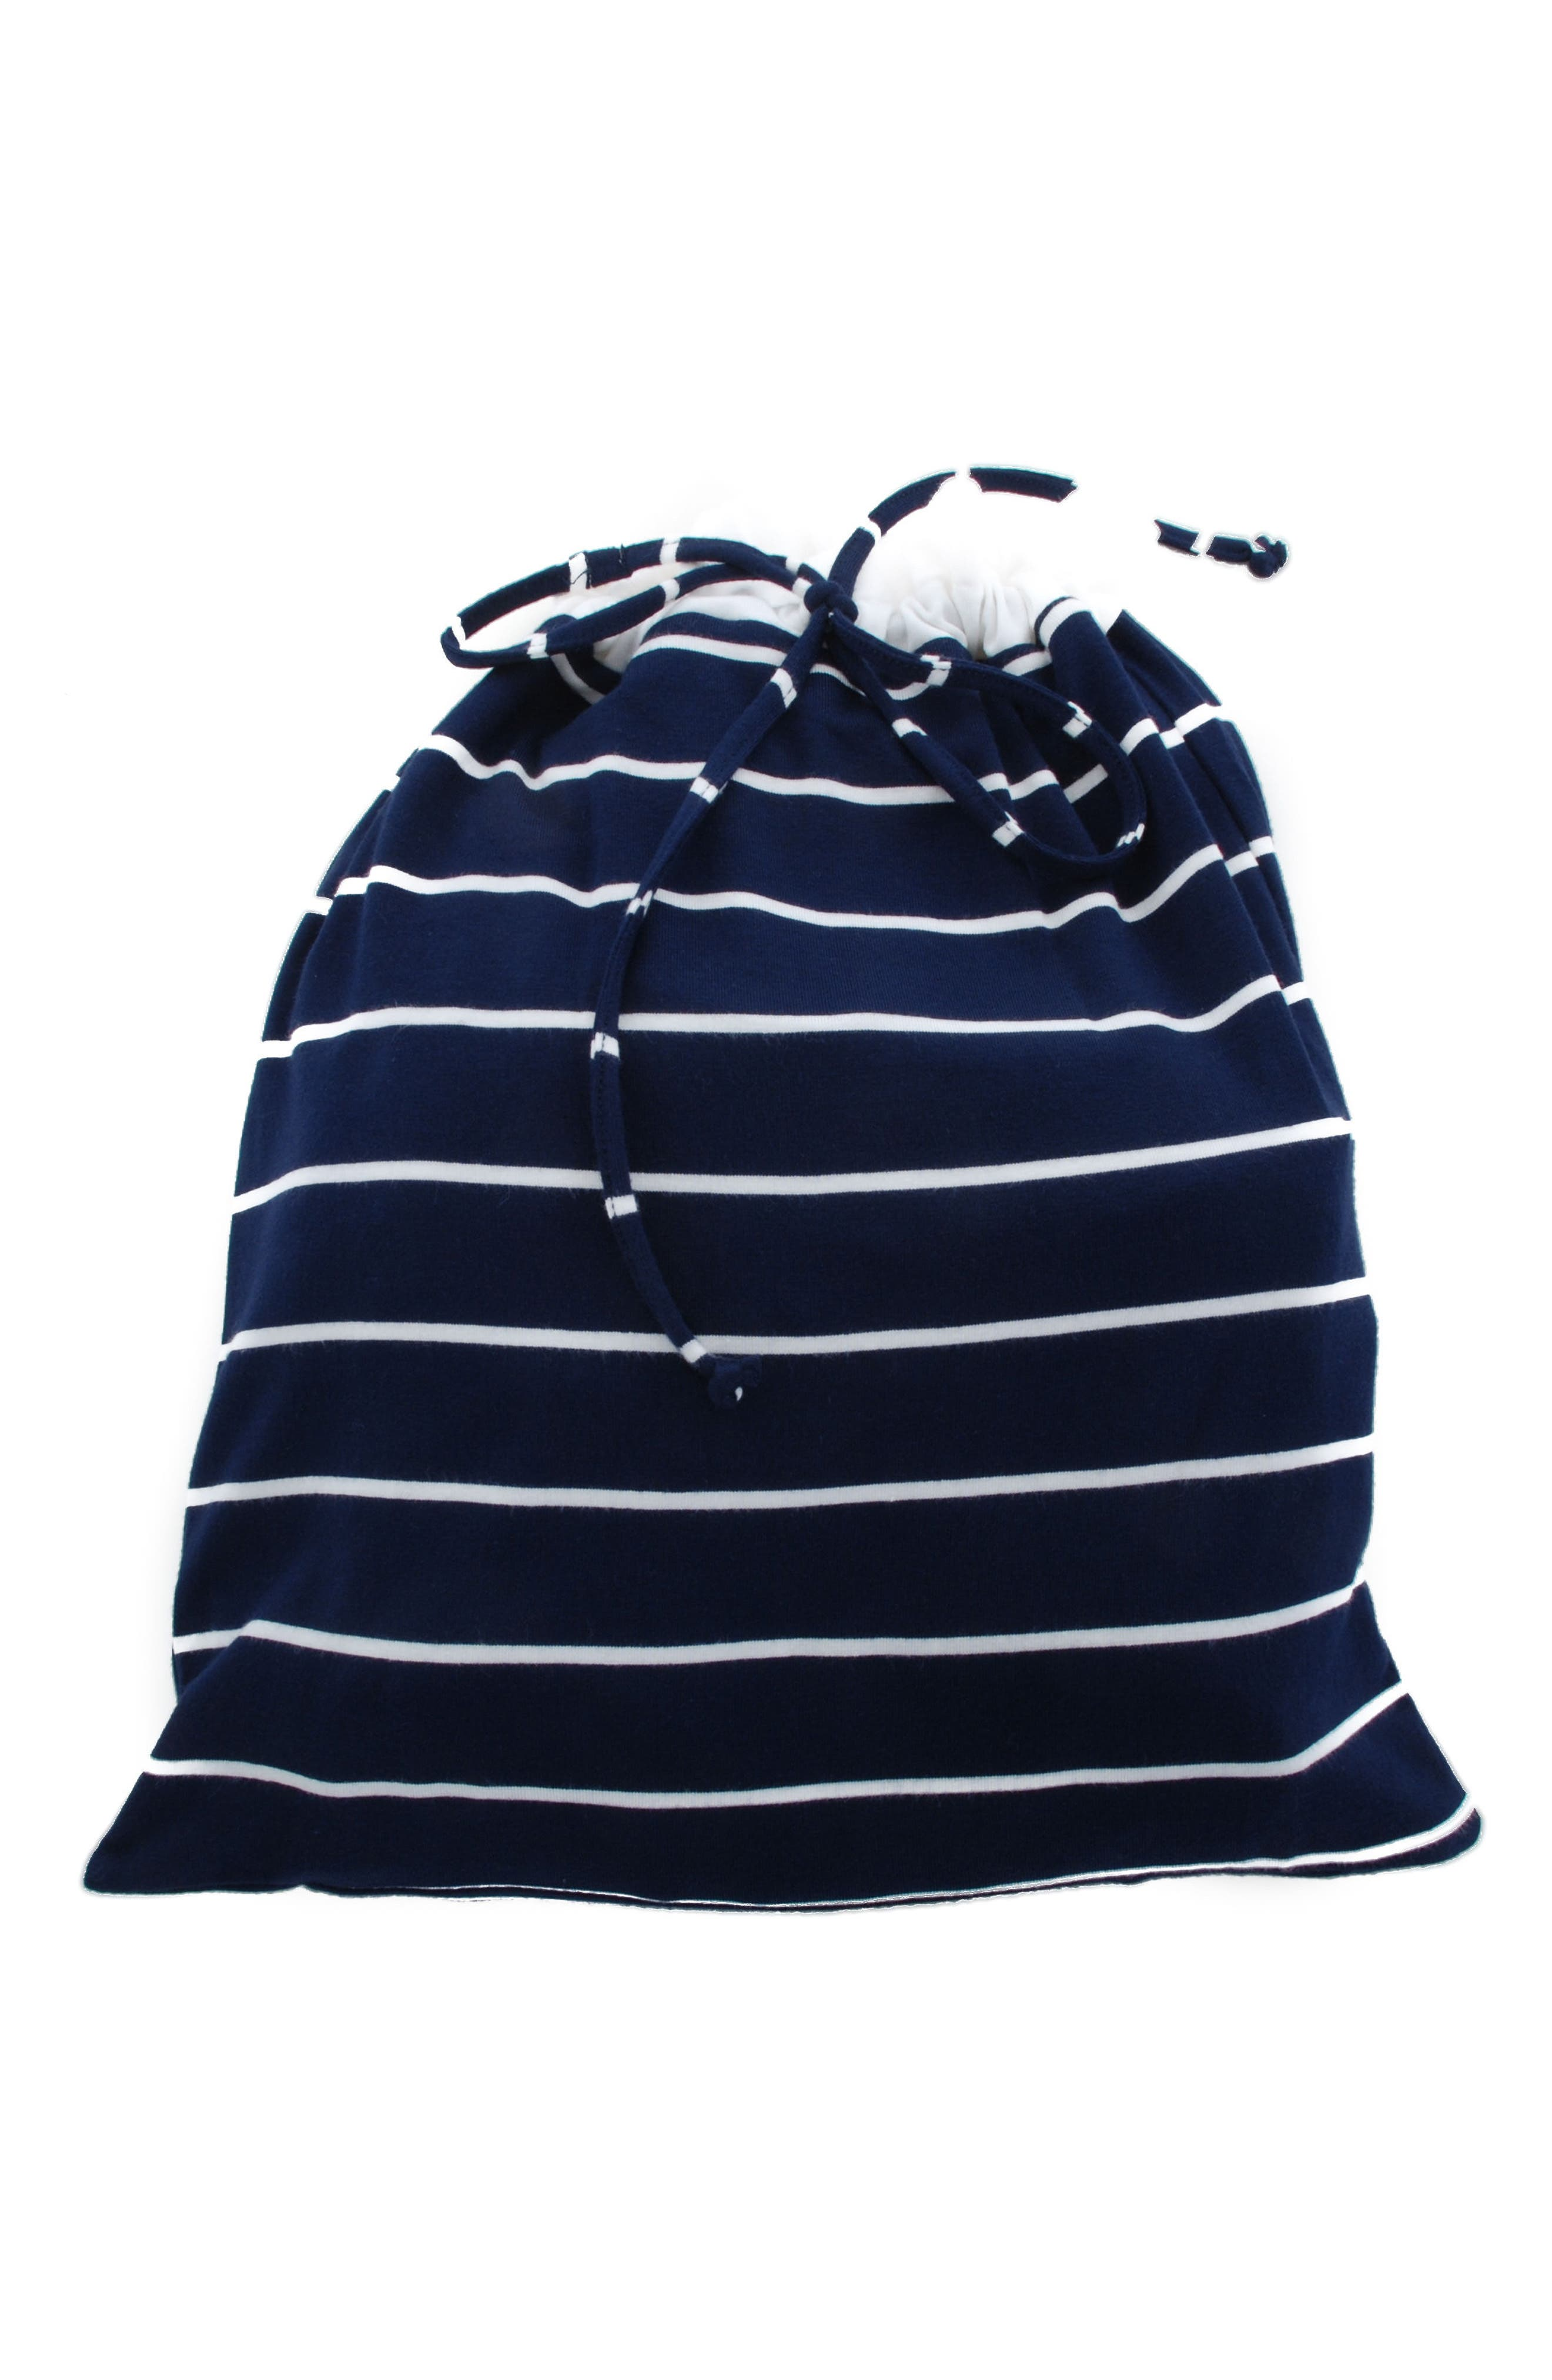 EVERLY GREY,                             Adalia 5-Piece Maternity/Nursing Pajama Set,                             Alternate thumbnail 6, color,                             NAVY STRIPE